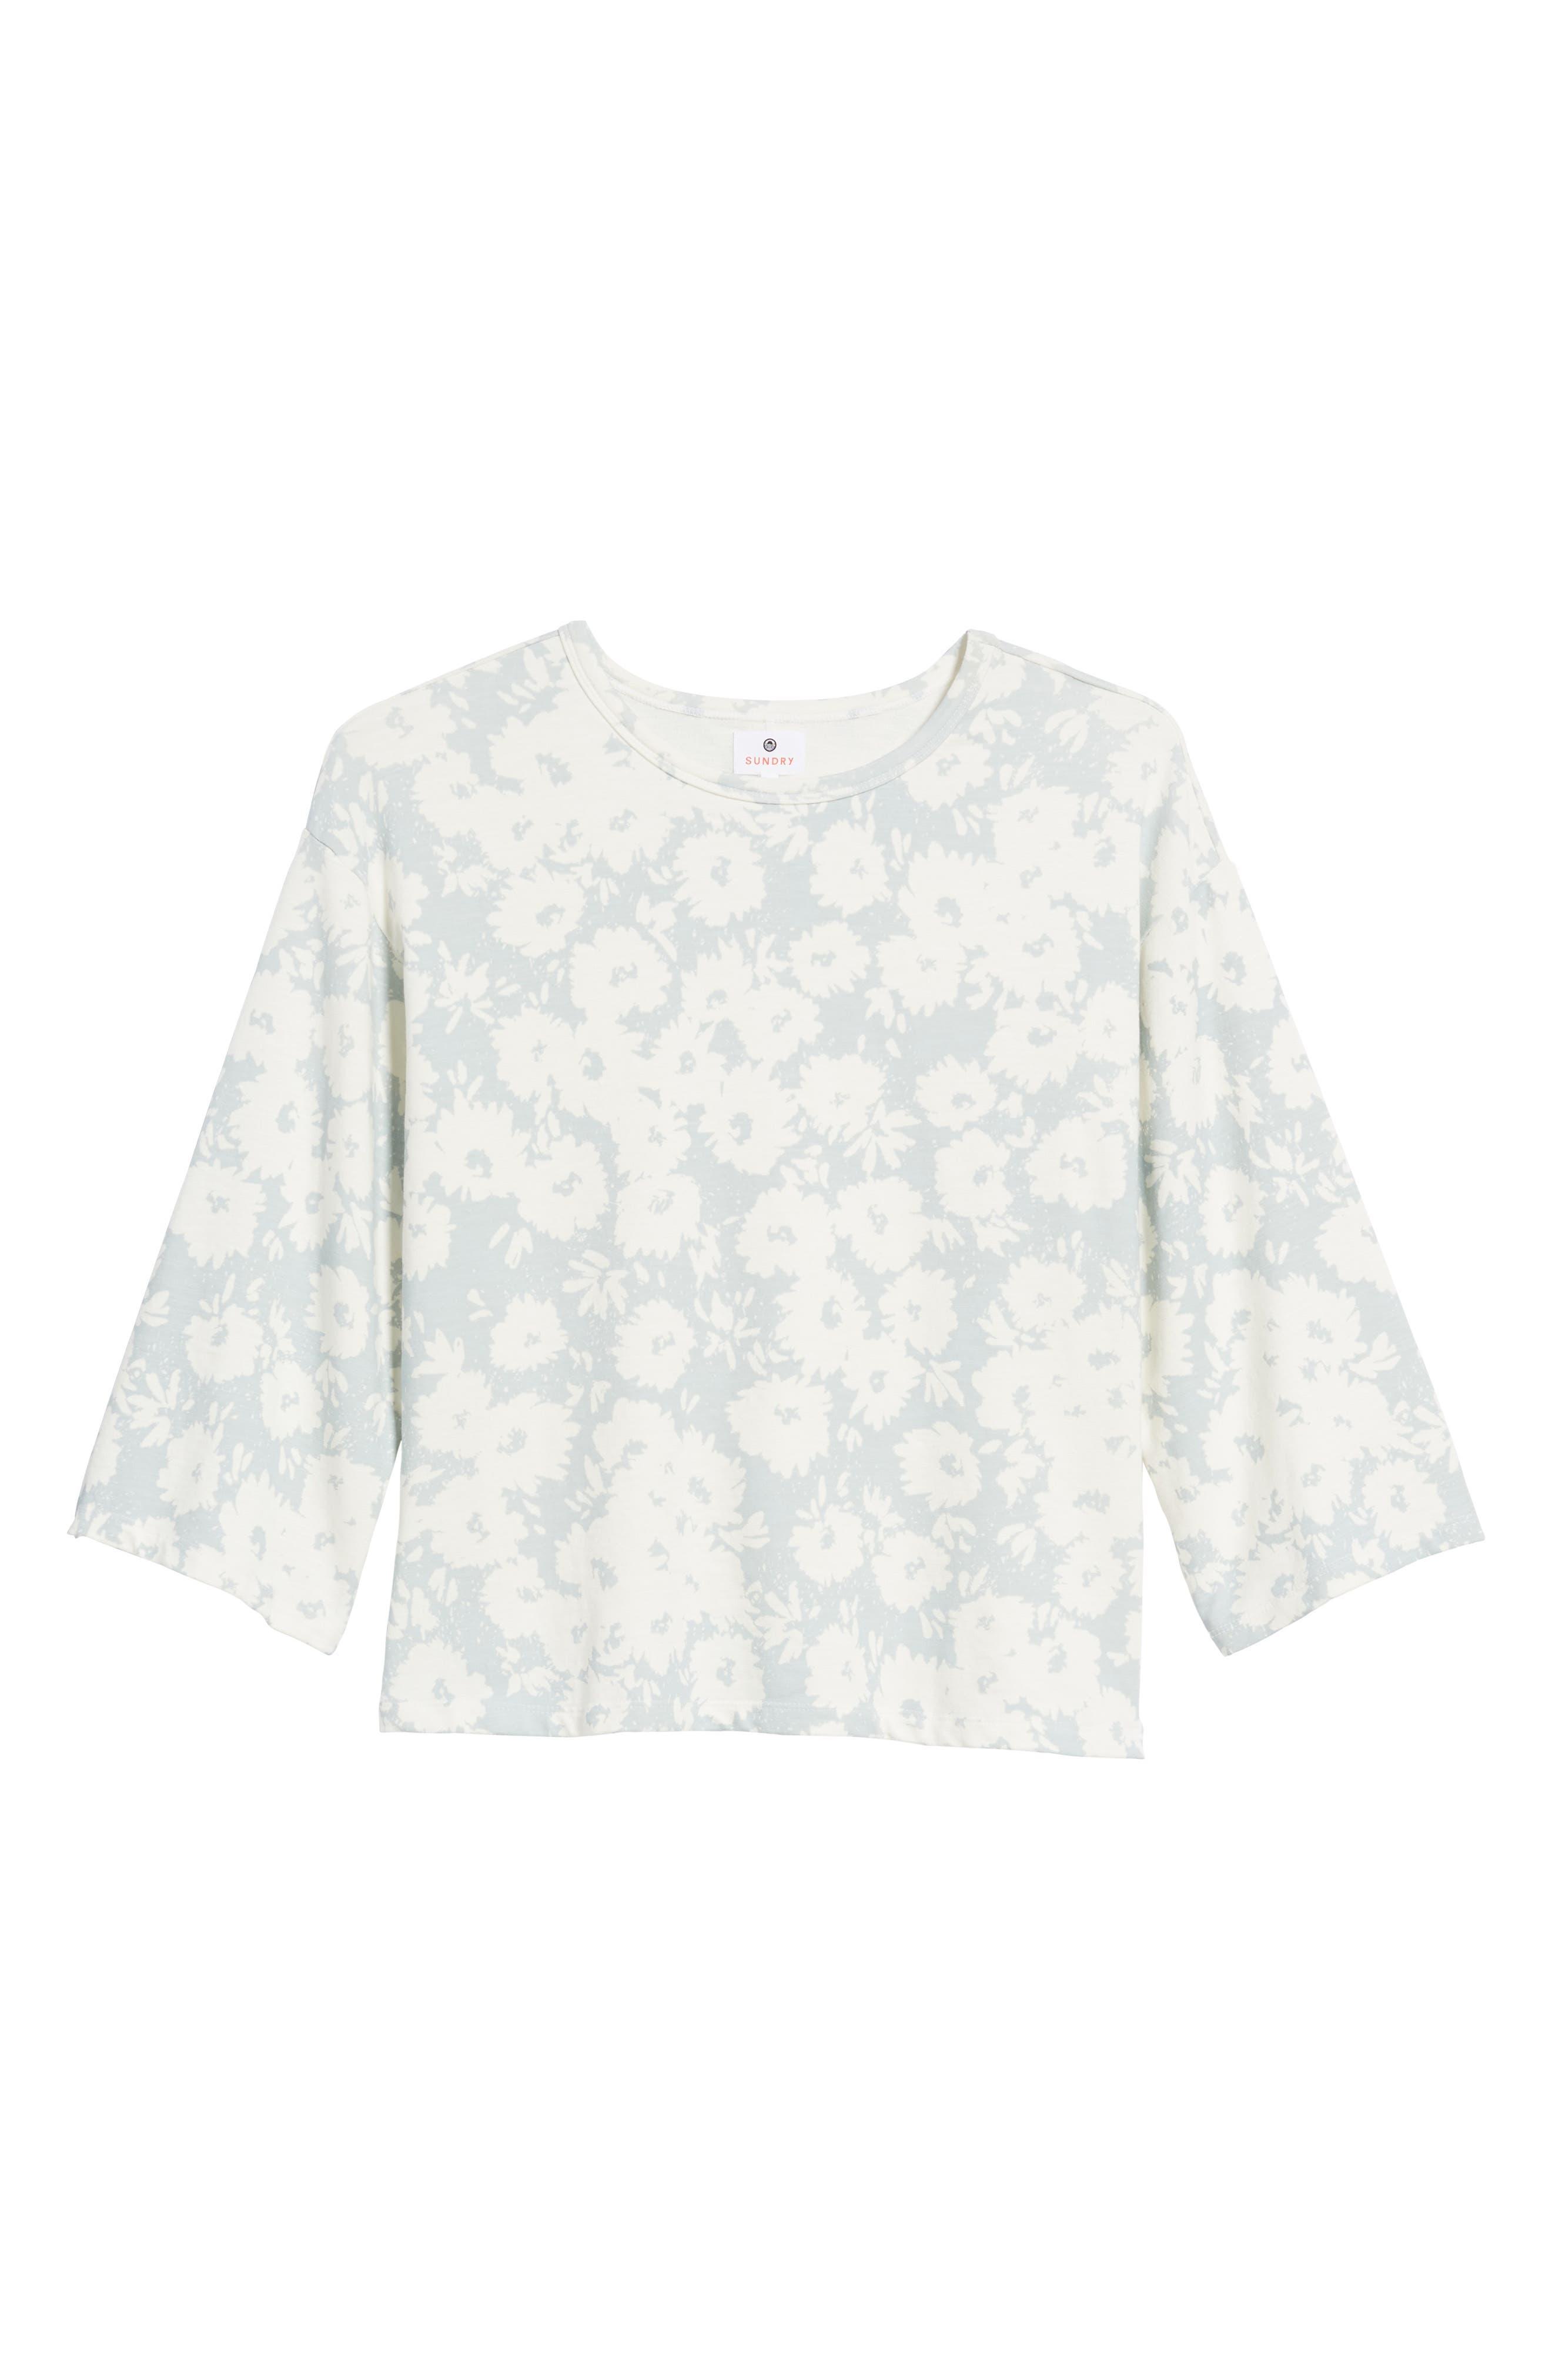 Kimono Sweatshirt,                             Alternate thumbnail 7, color,                             451